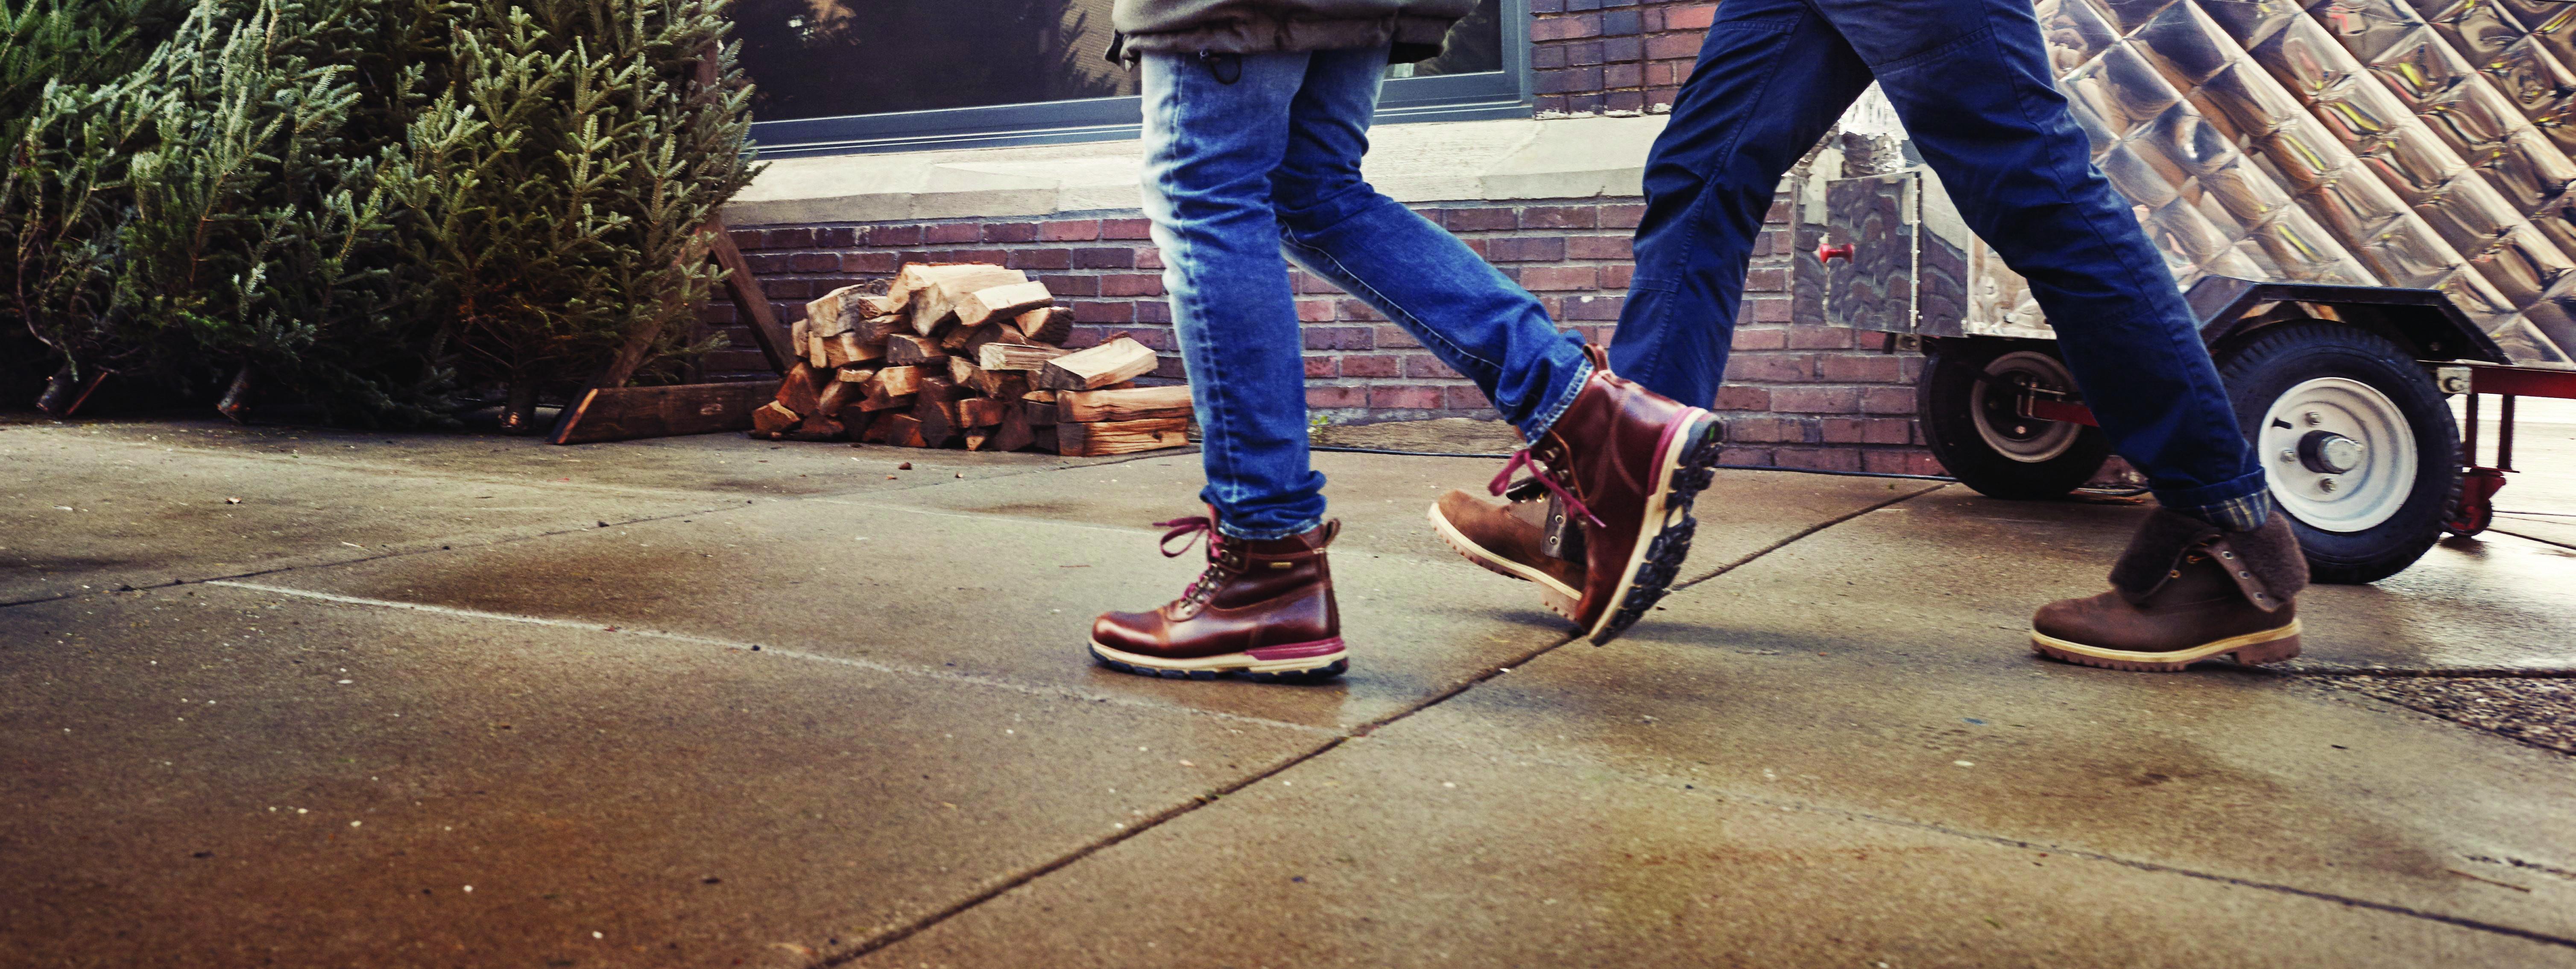 grande Librería darse cuenta  A Guide to Timberland Boots - AllSole - The Blog